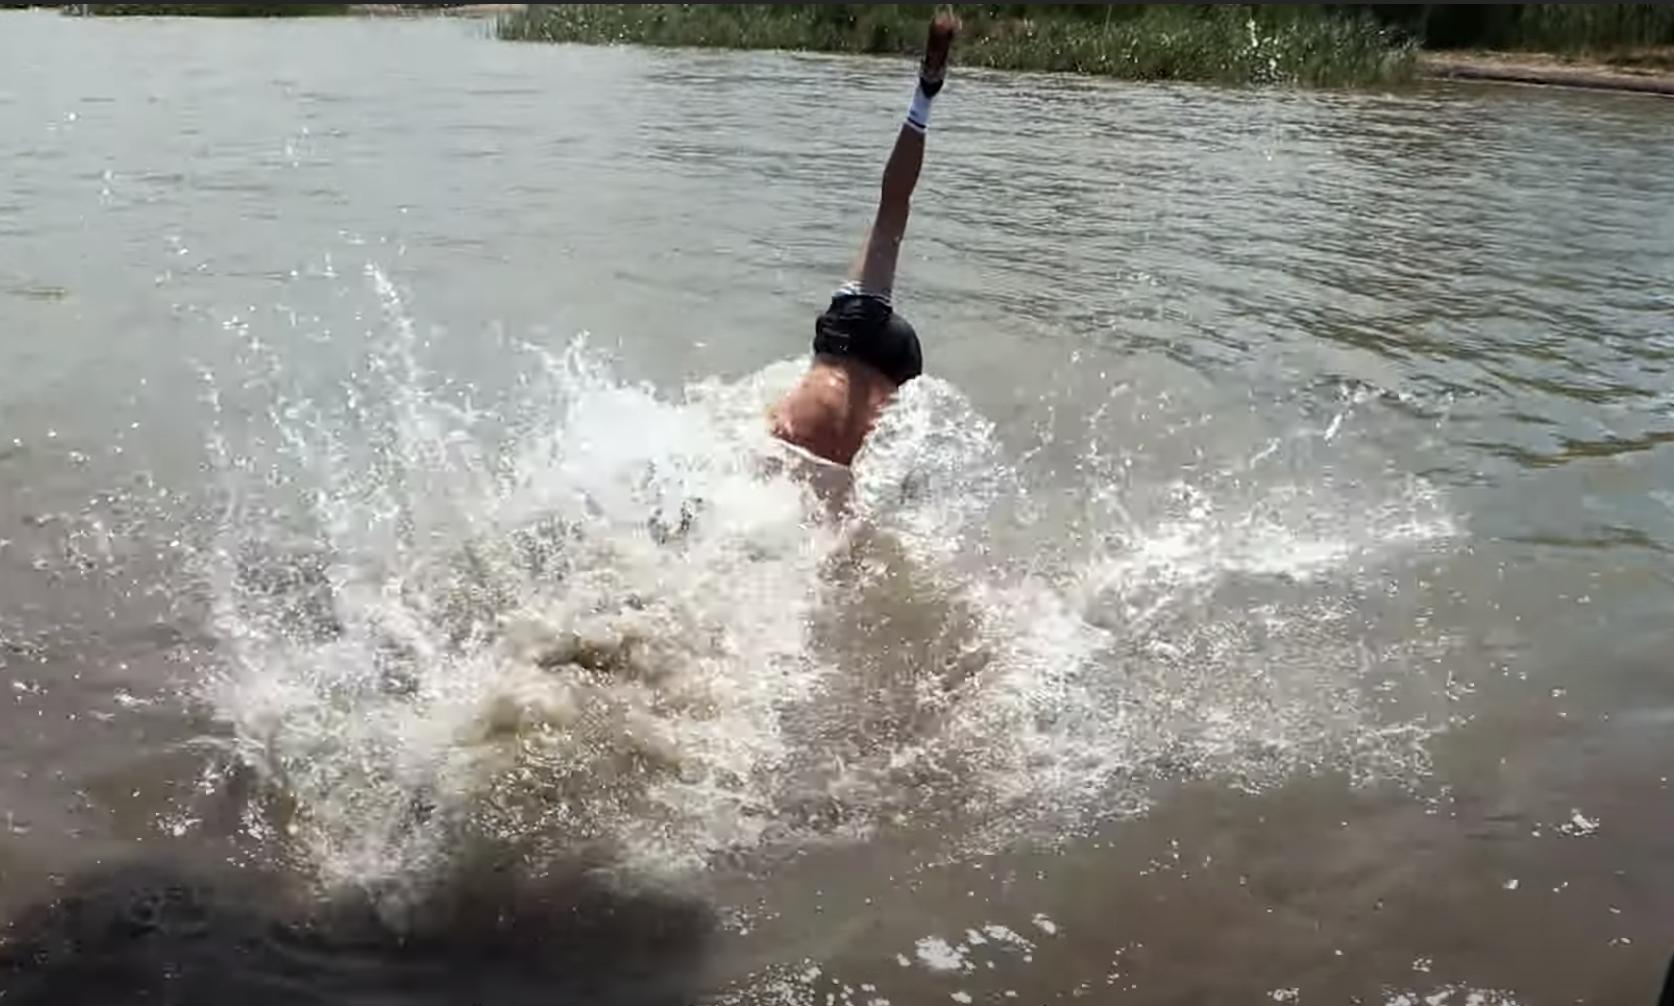 Jeff falling into the lake